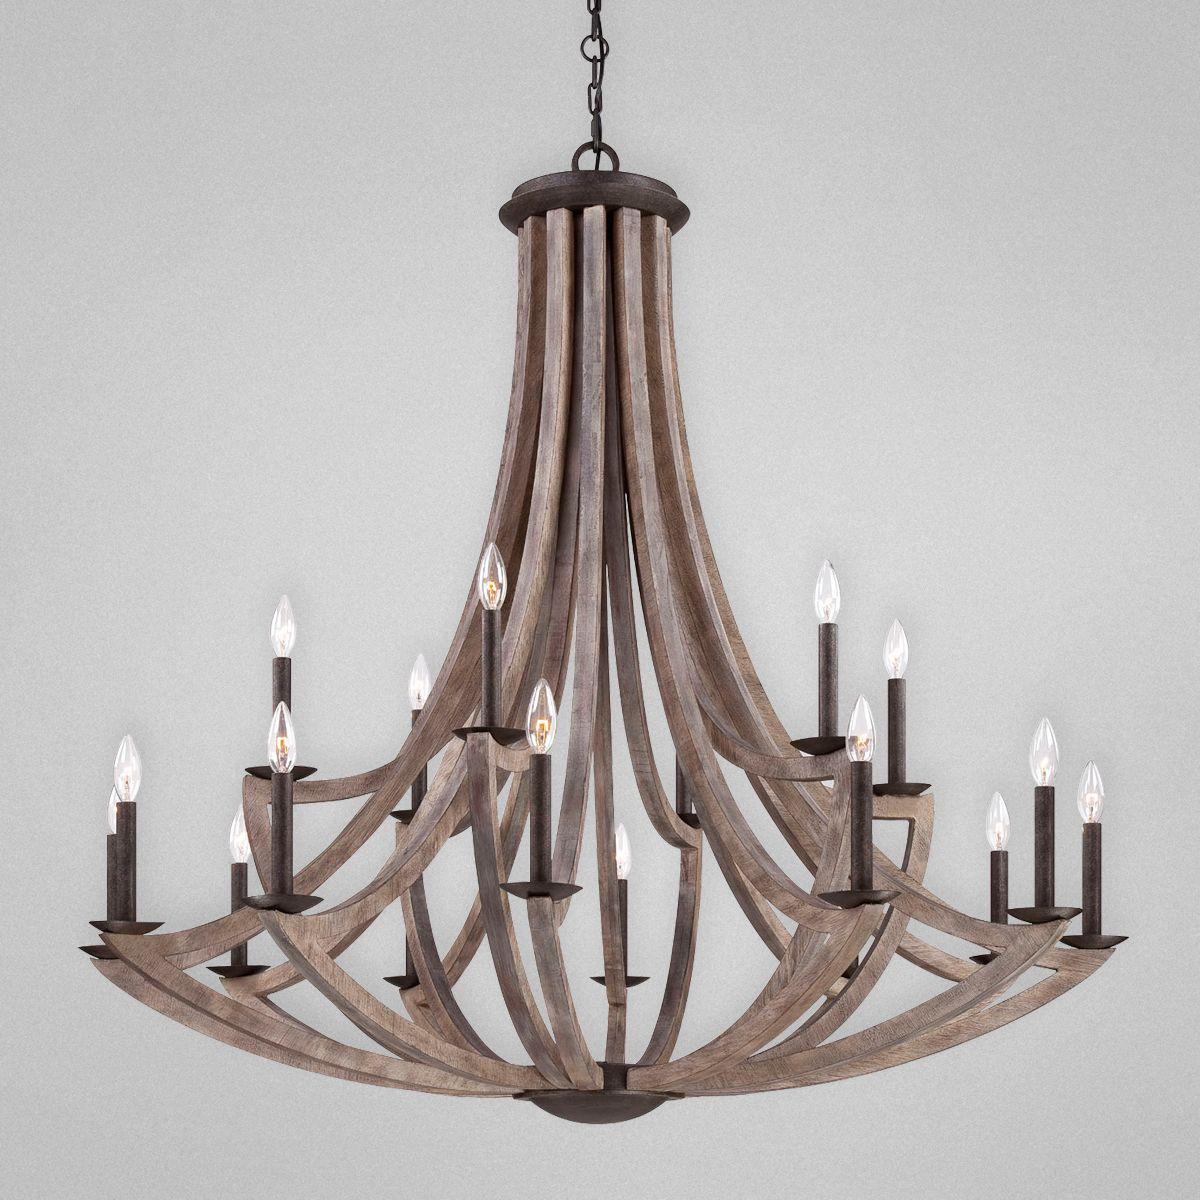 Aden Star Ltd LLC dba 1020 Decor Arcata Bronze Iron and Wood 18 – Wood Chandelier Lighting